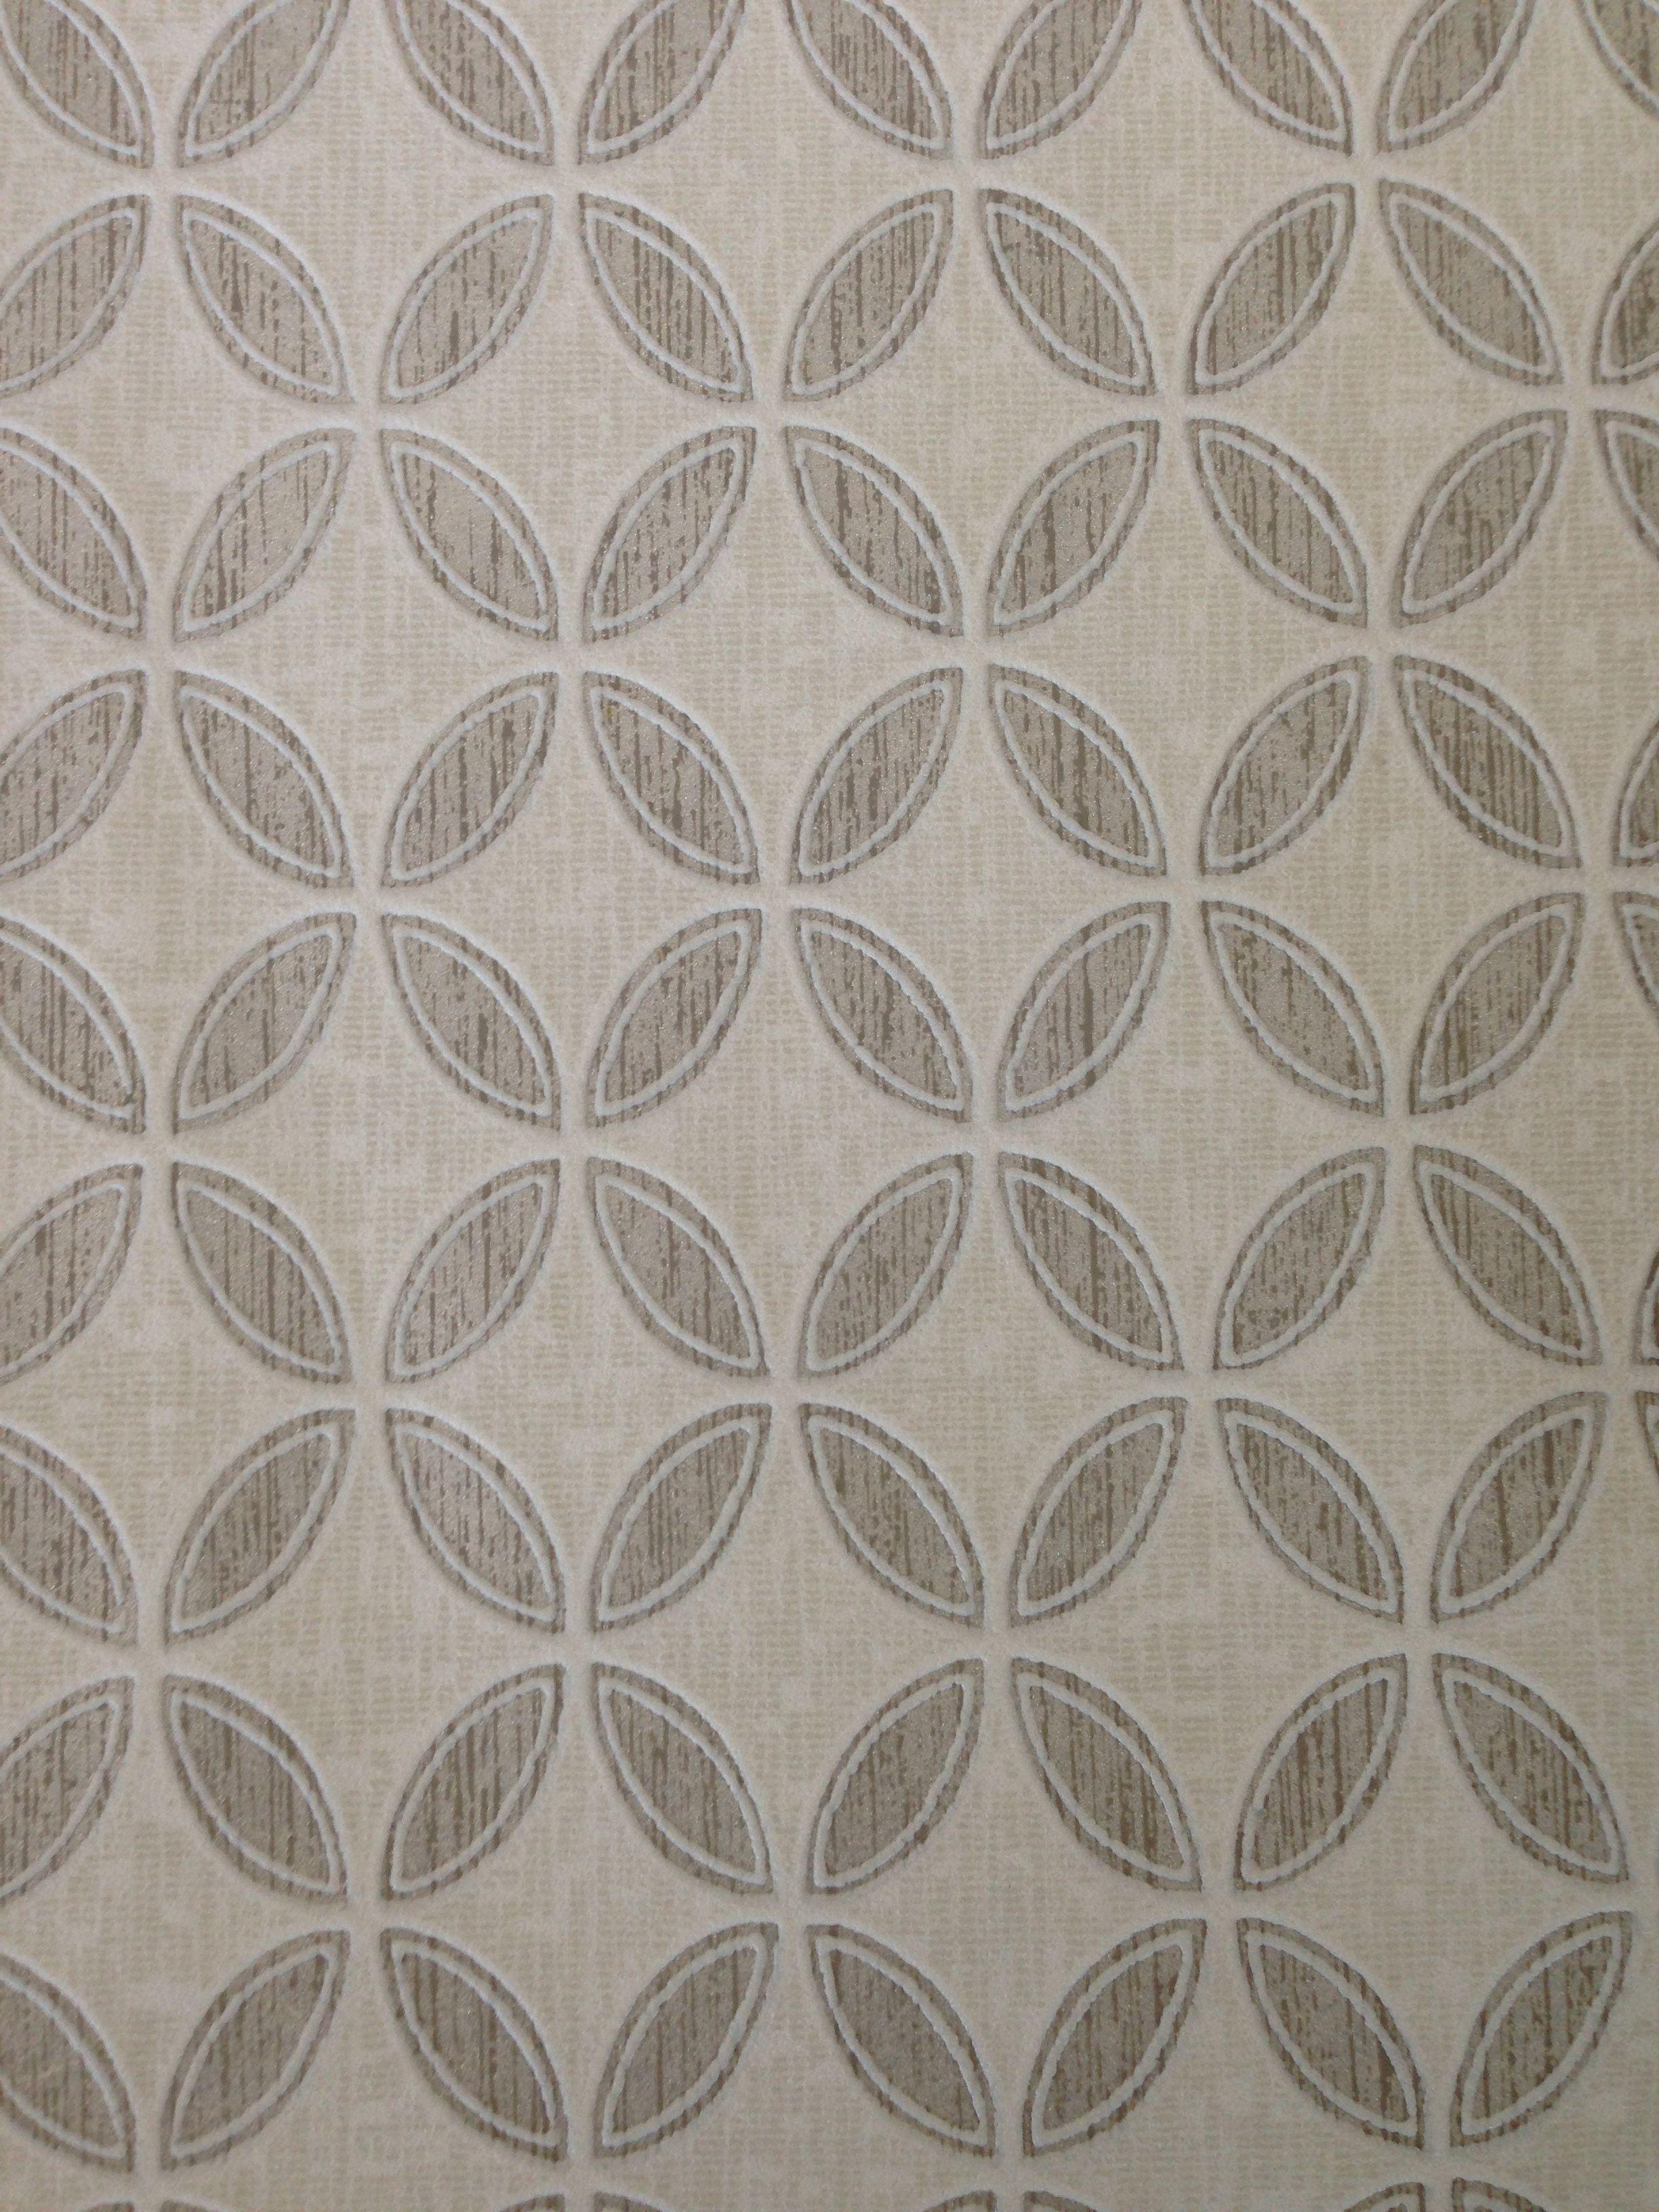 Tapetenmuster aus der kollekton central park in stoff optik tapeten zoom tapeten - Wandbilder aus stoff ...